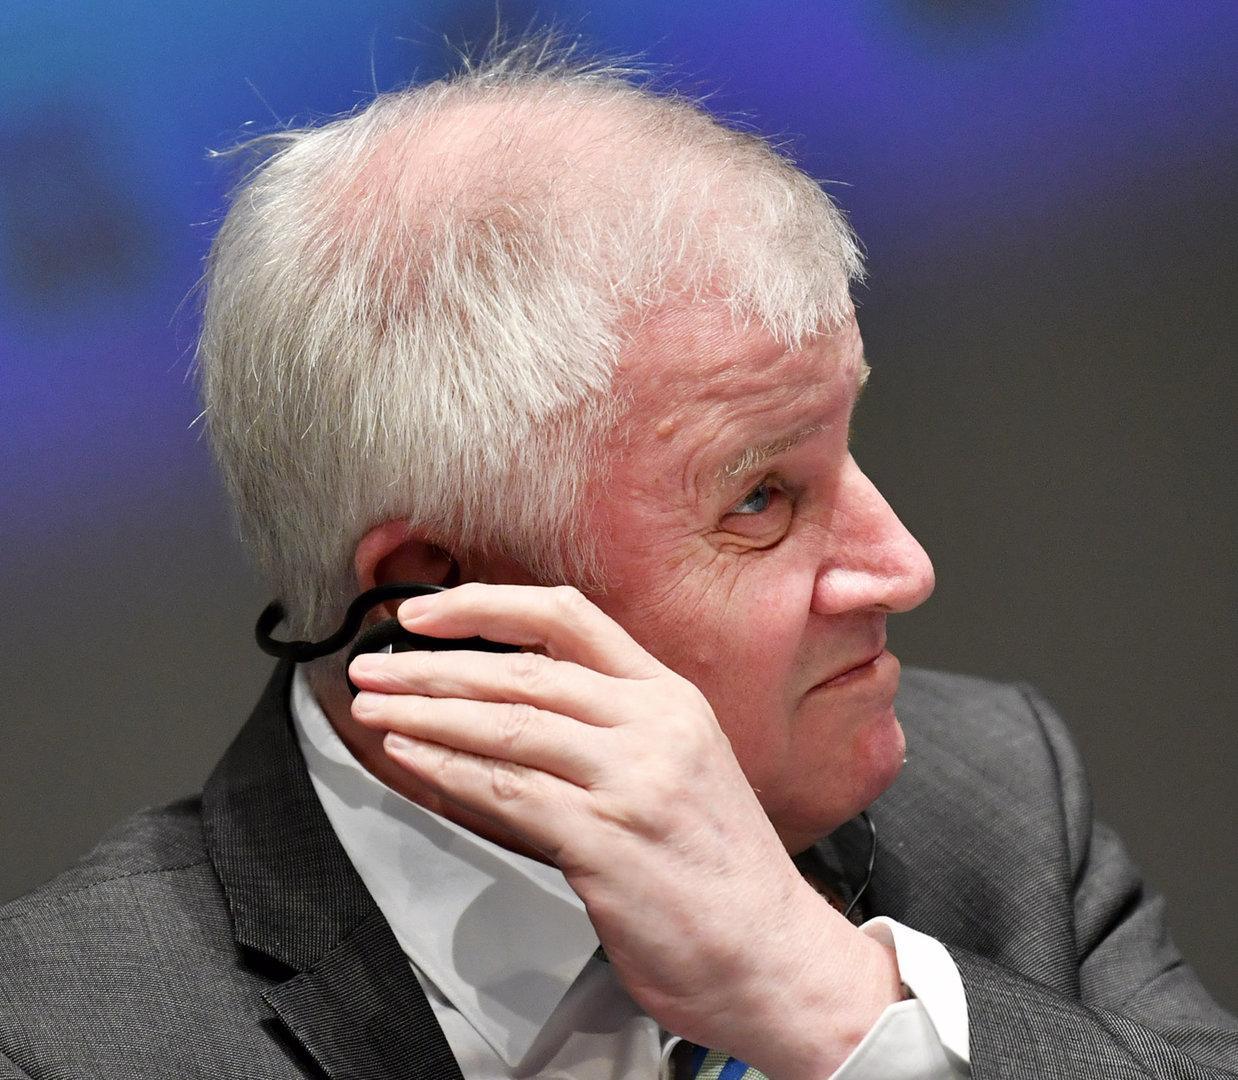 Mehrheit der CSU-Anhänger für Seehofers Rücktritt